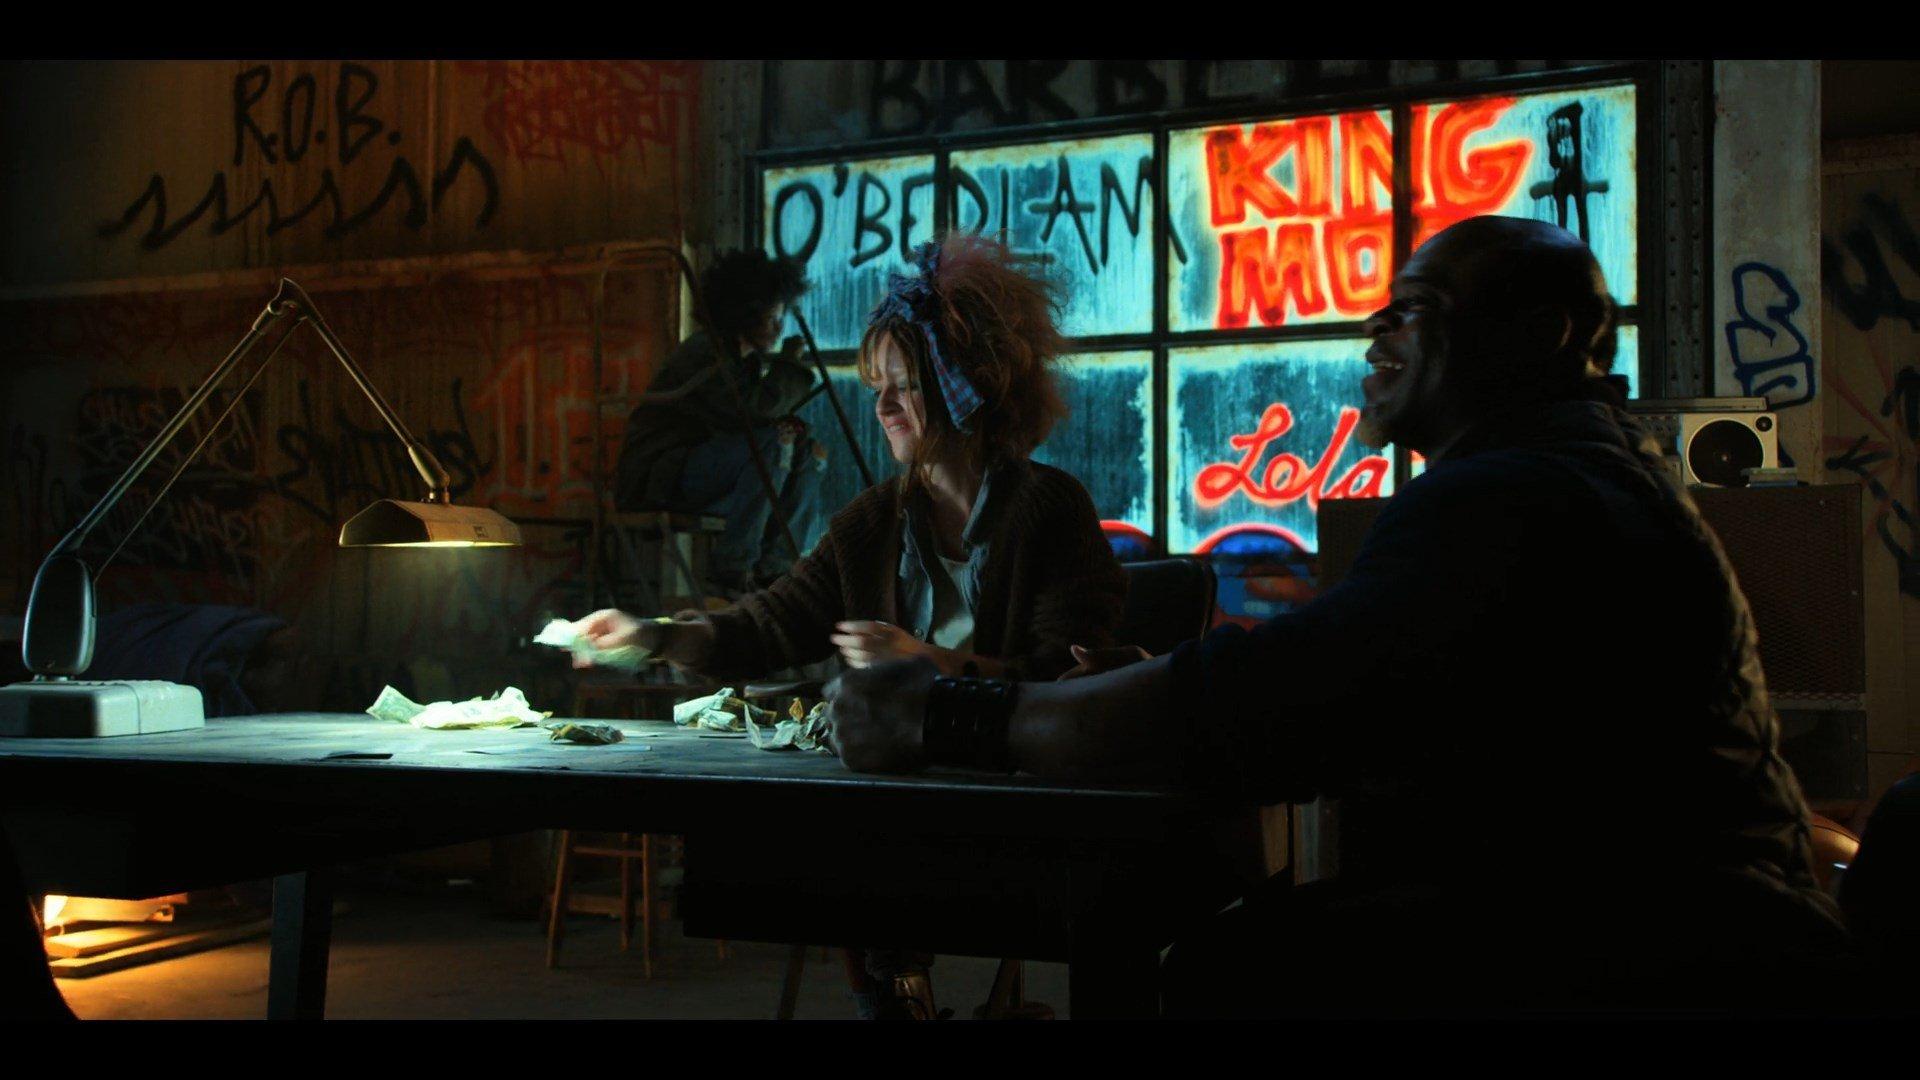 Stranger-Things-Season-02-Episode-07-Grant-Morrison-The-Invisibles